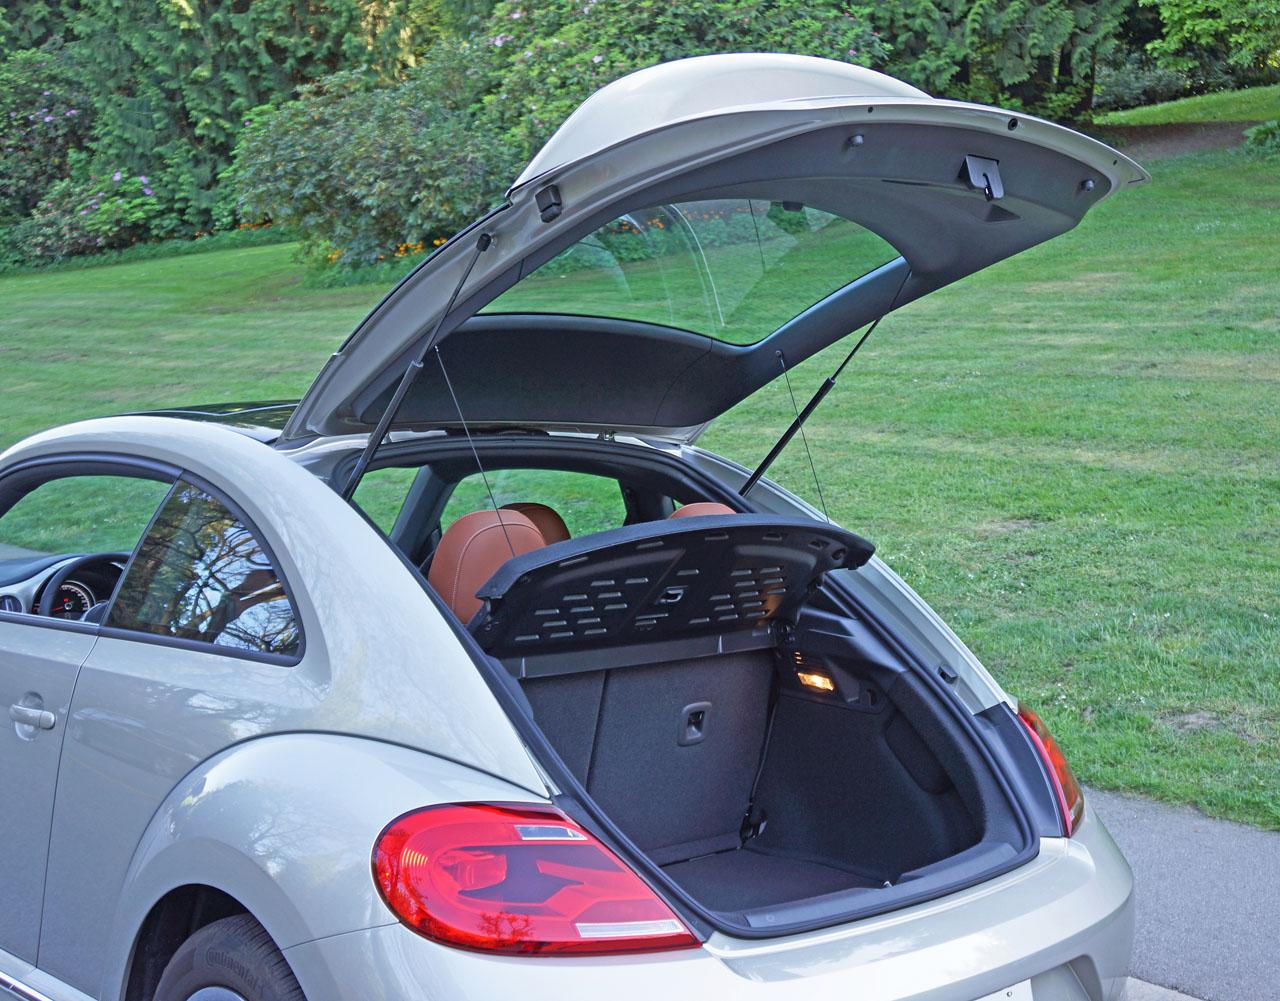 ontario inventory beetle in volkswagen whitby en for sale new bugs